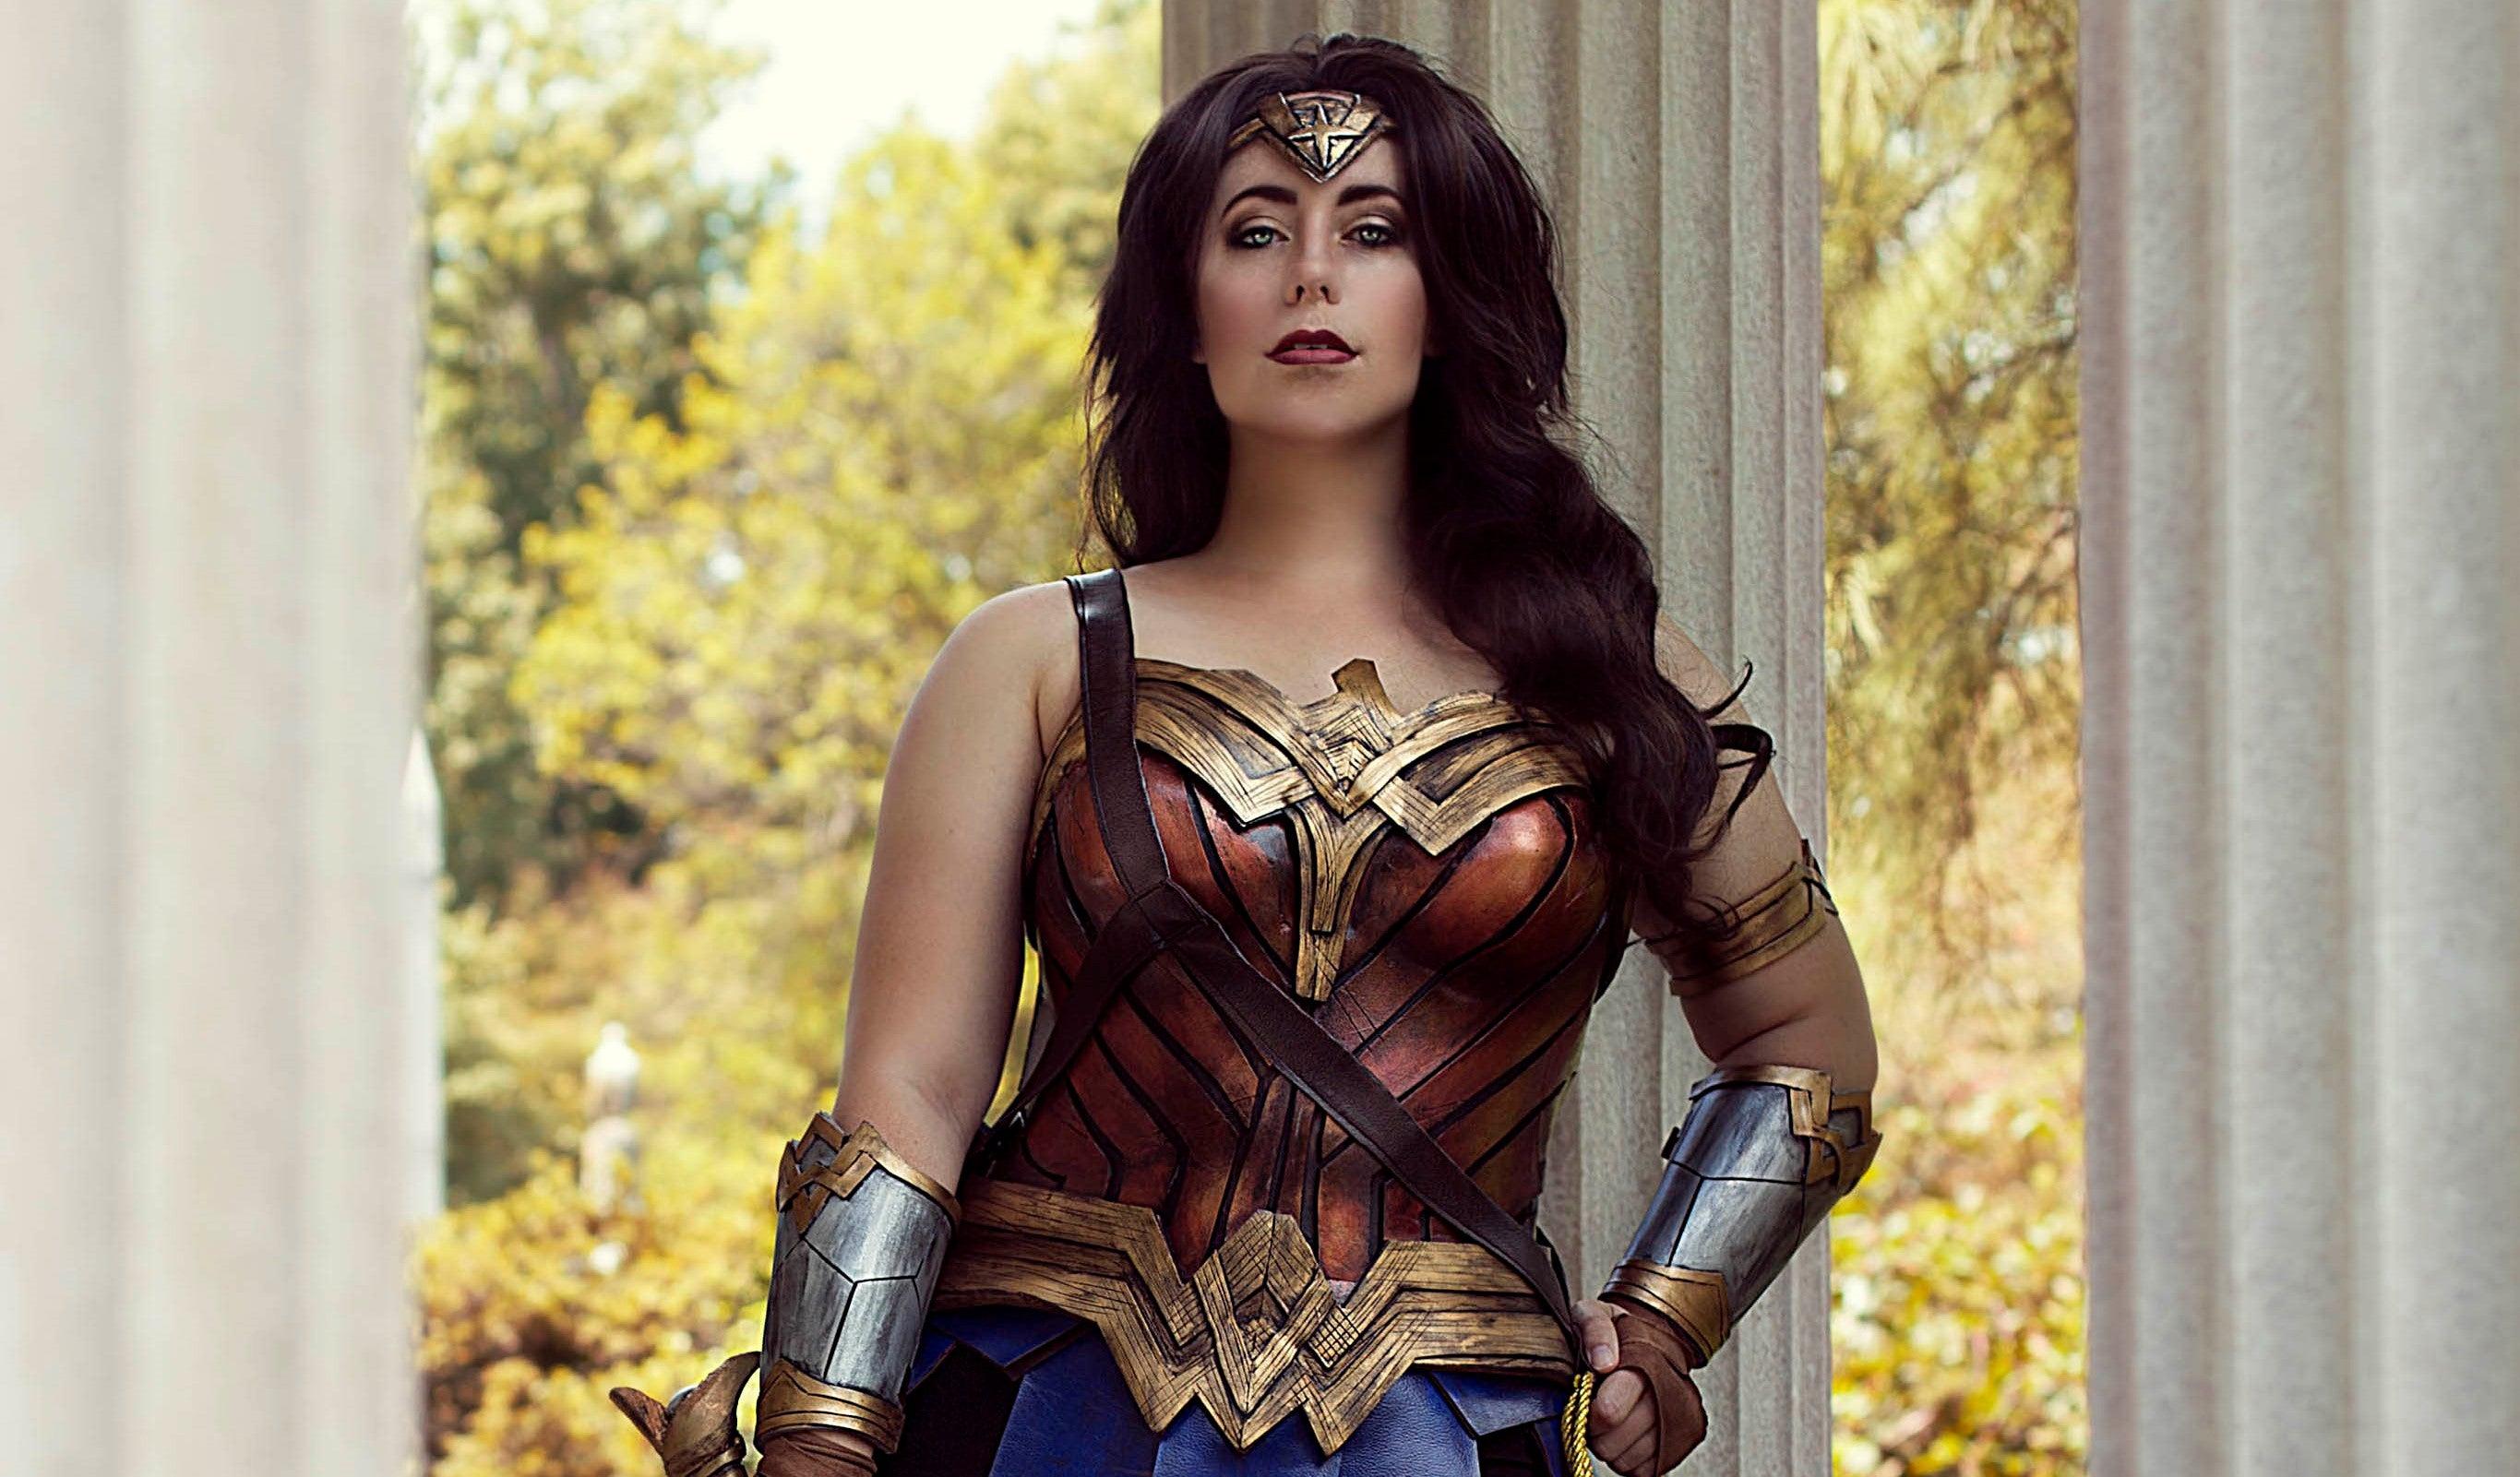 Jedimanda as Wonder Woman (Photography by Alexandra Lee Studios)